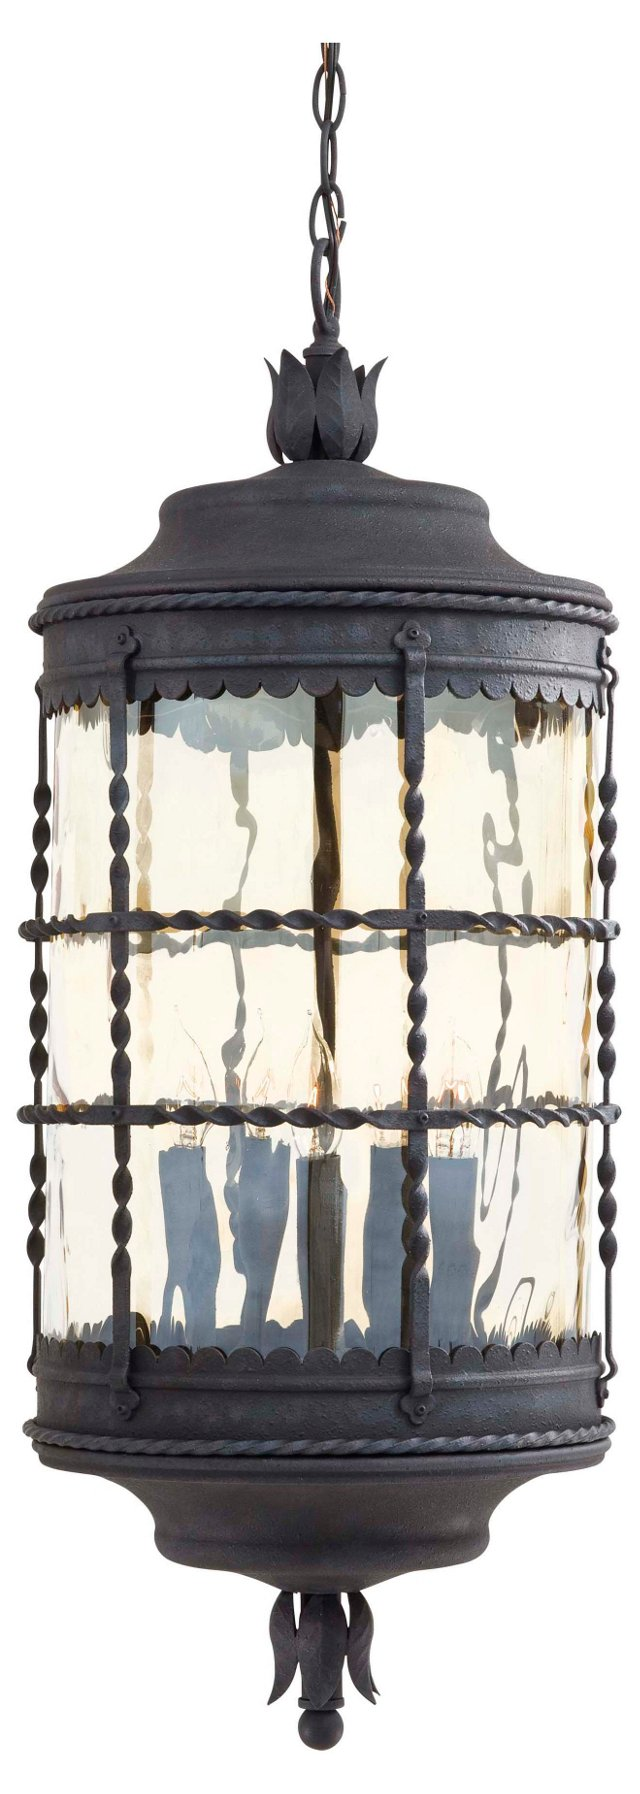 Mallorca 5-Light Hanging Lantern, Iron